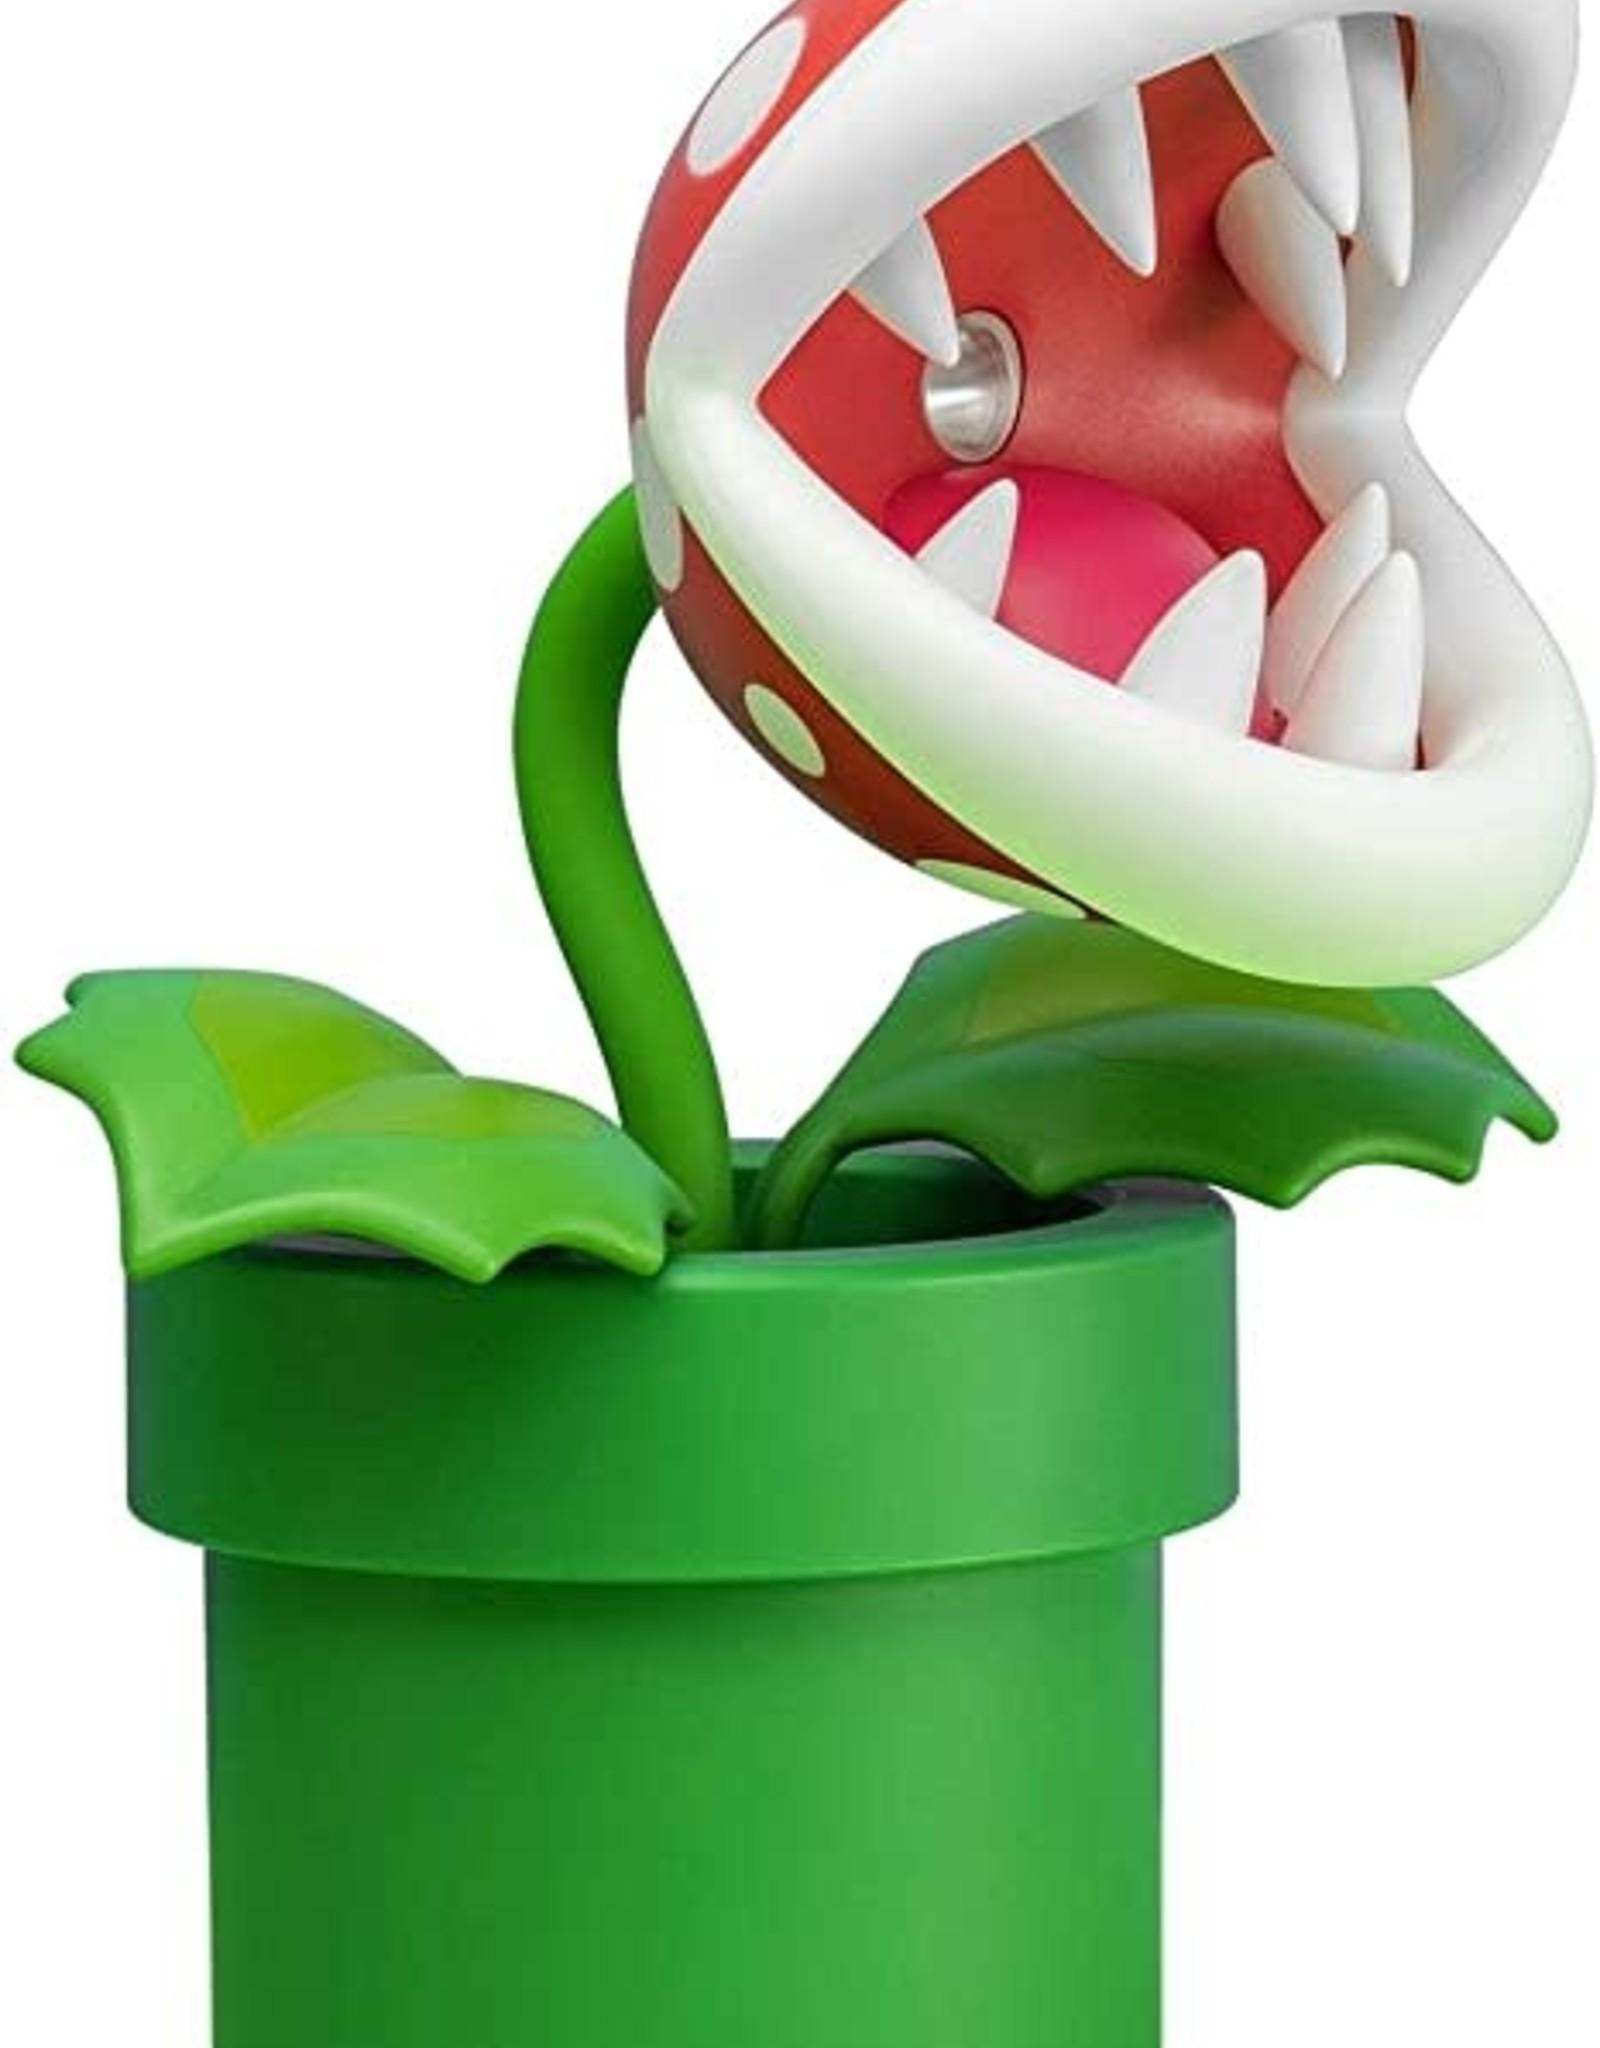 Paladone Super Mario Piranha Plant Posable Lamp